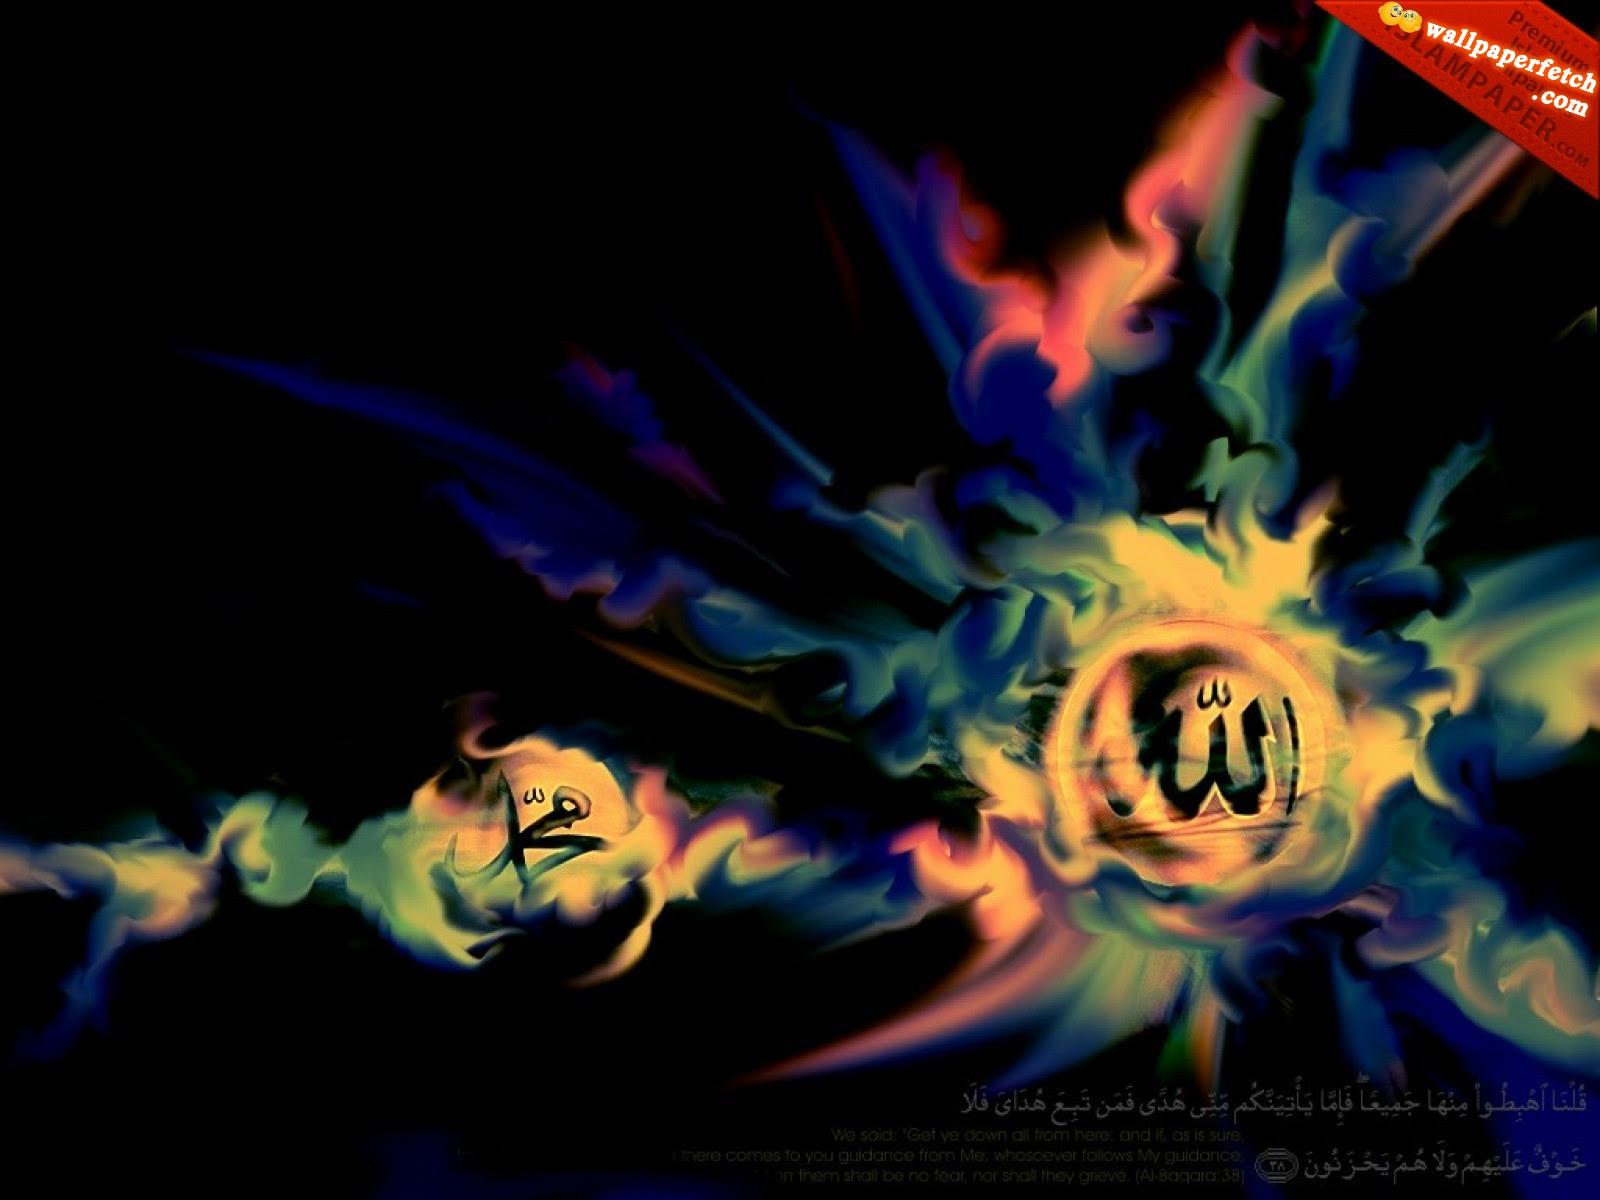 Unduh 5100 Allah Yazısı Wallpaper HD Terbaik